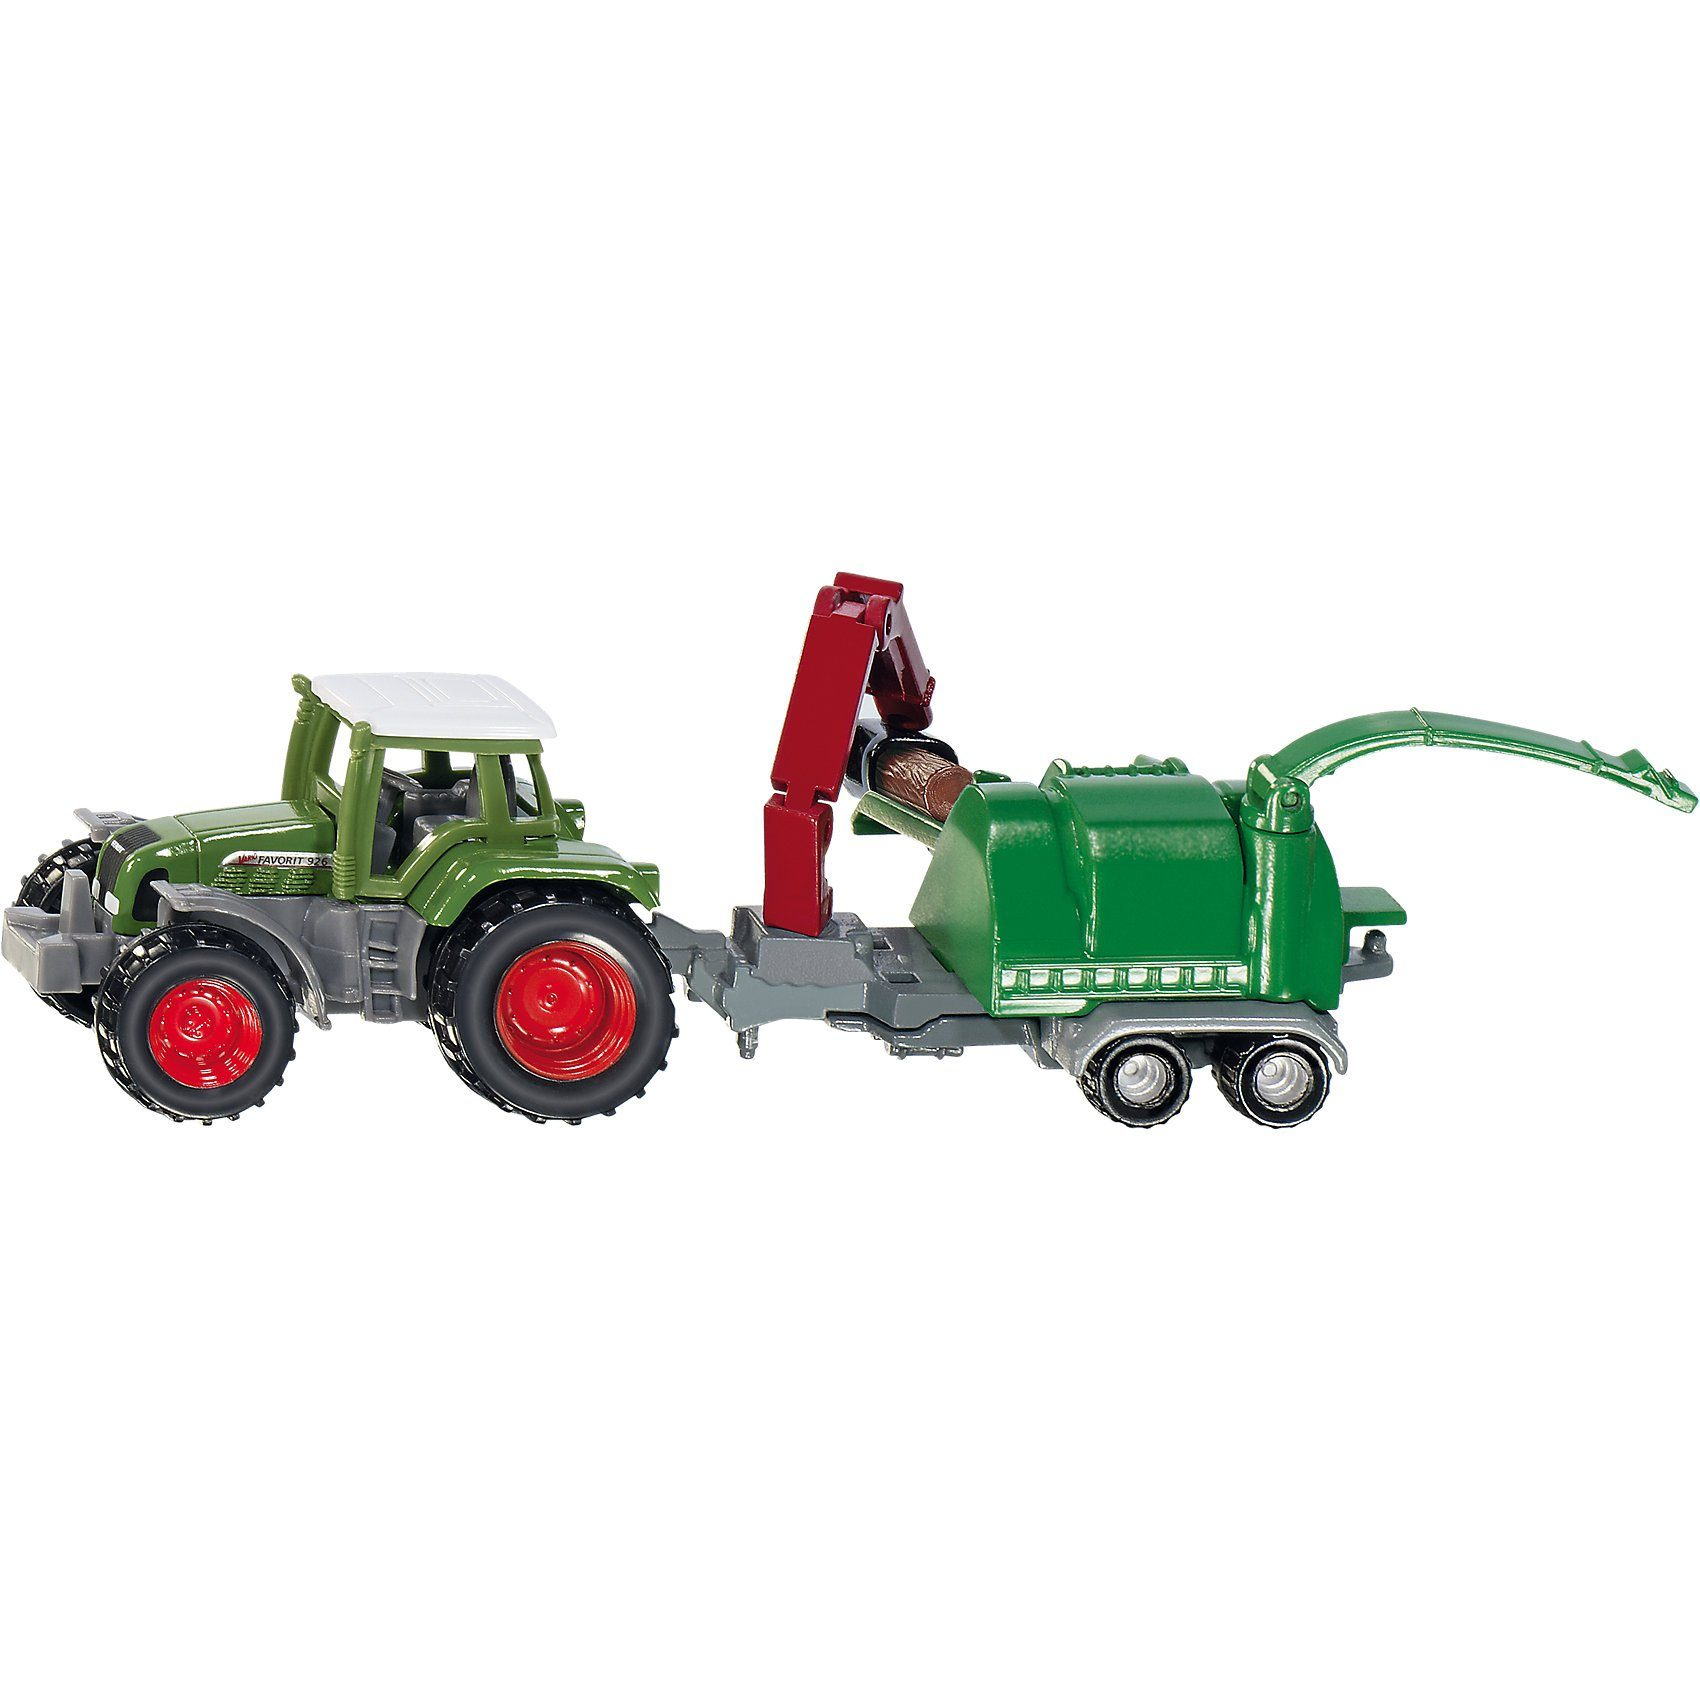 SIKU 1675 Traktor mit Holzhäcksler